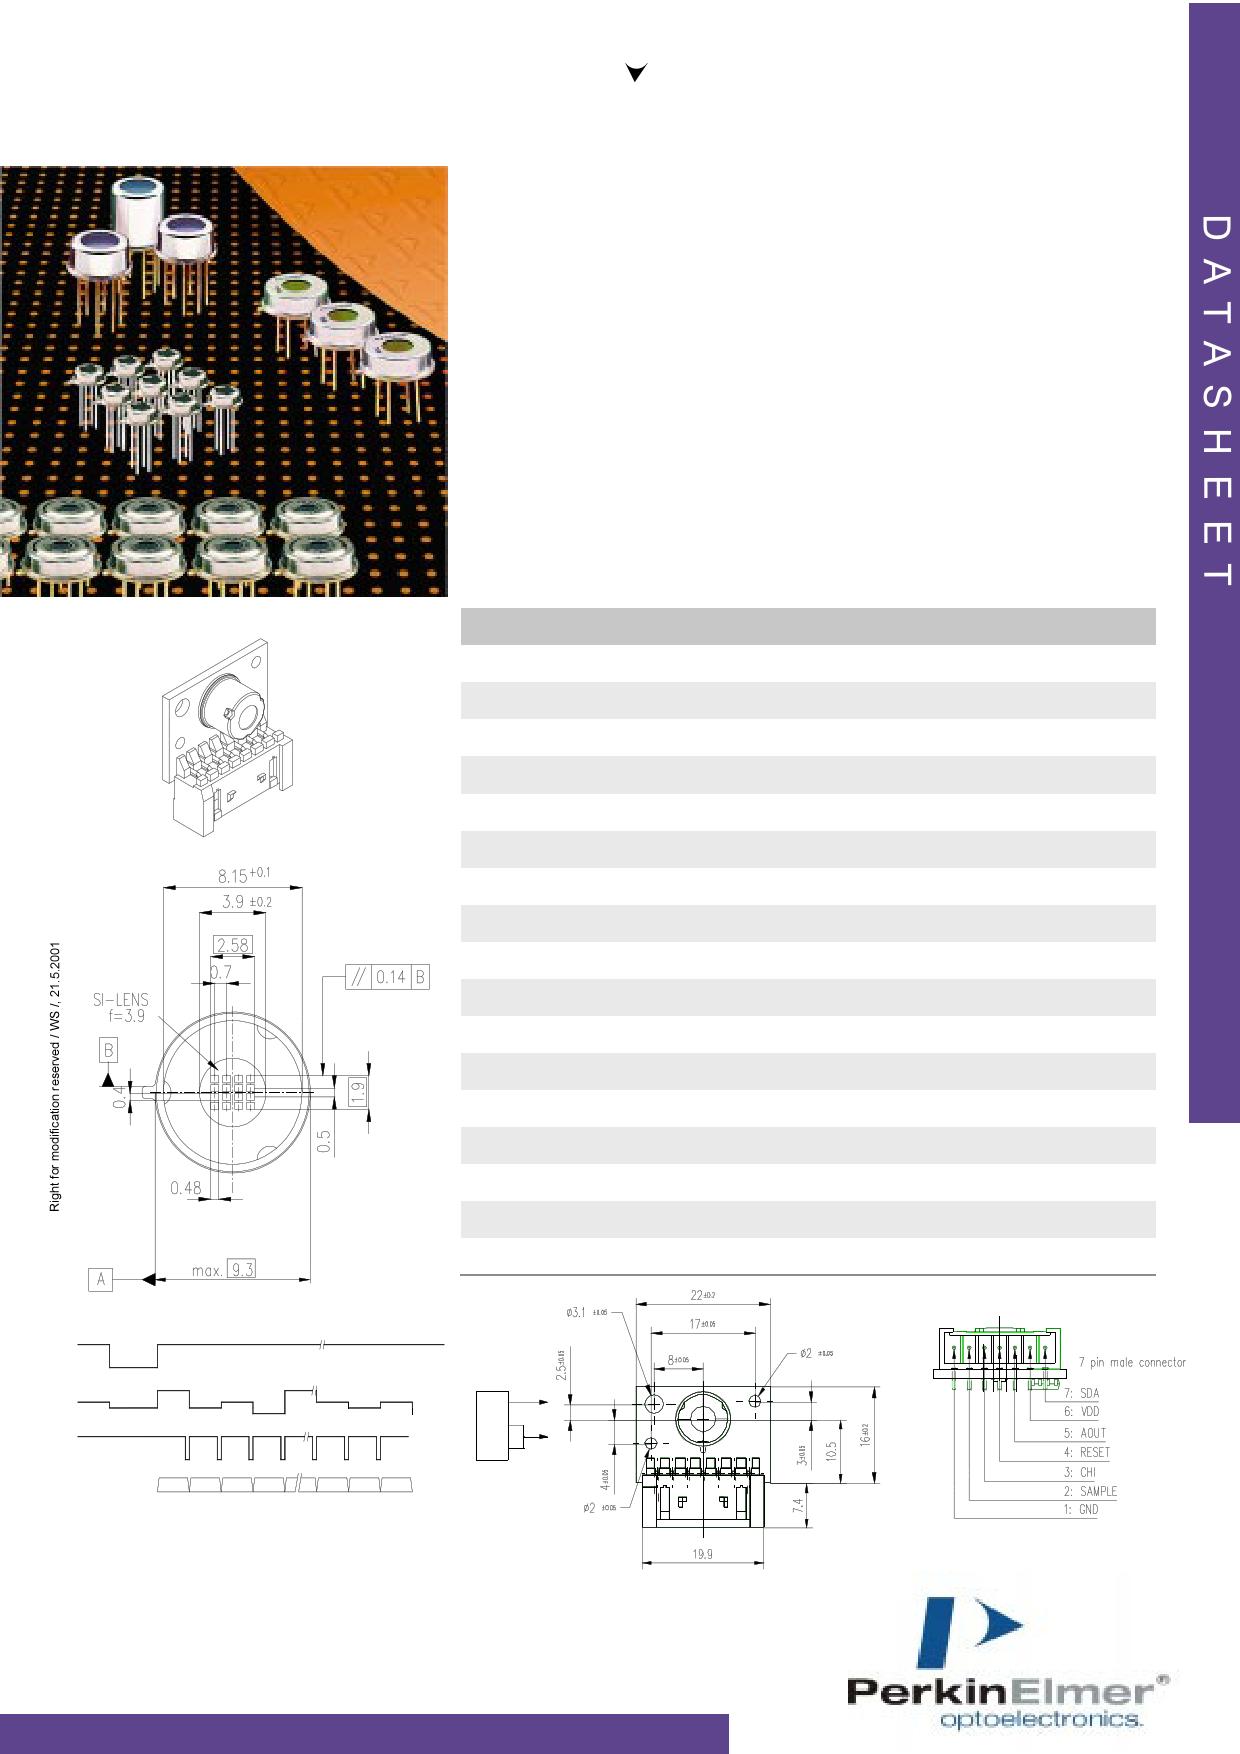 TPAM166L3.9 datasheet